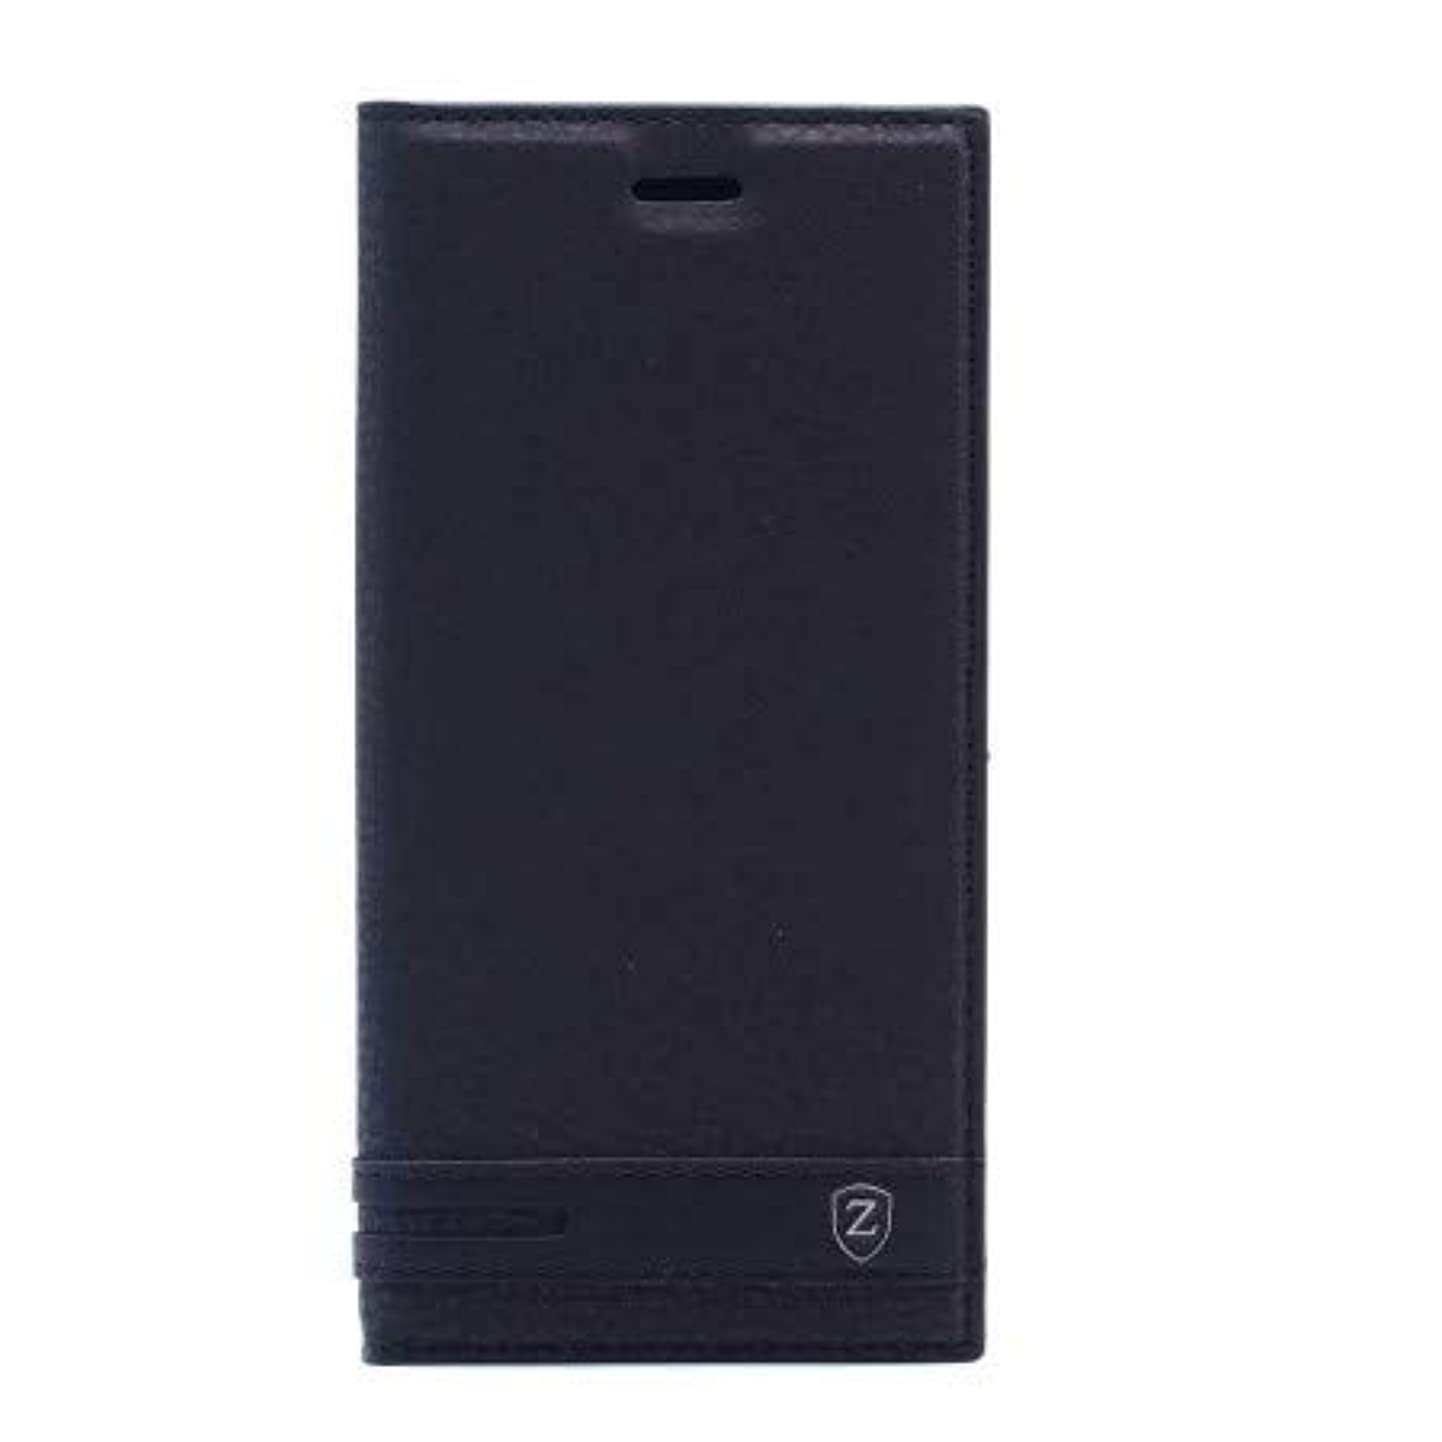 Teleplus for Huawei Mate 20 Lite Magnet Clamshell Case Black + Nano Screen Protector ljznnzhthjs6